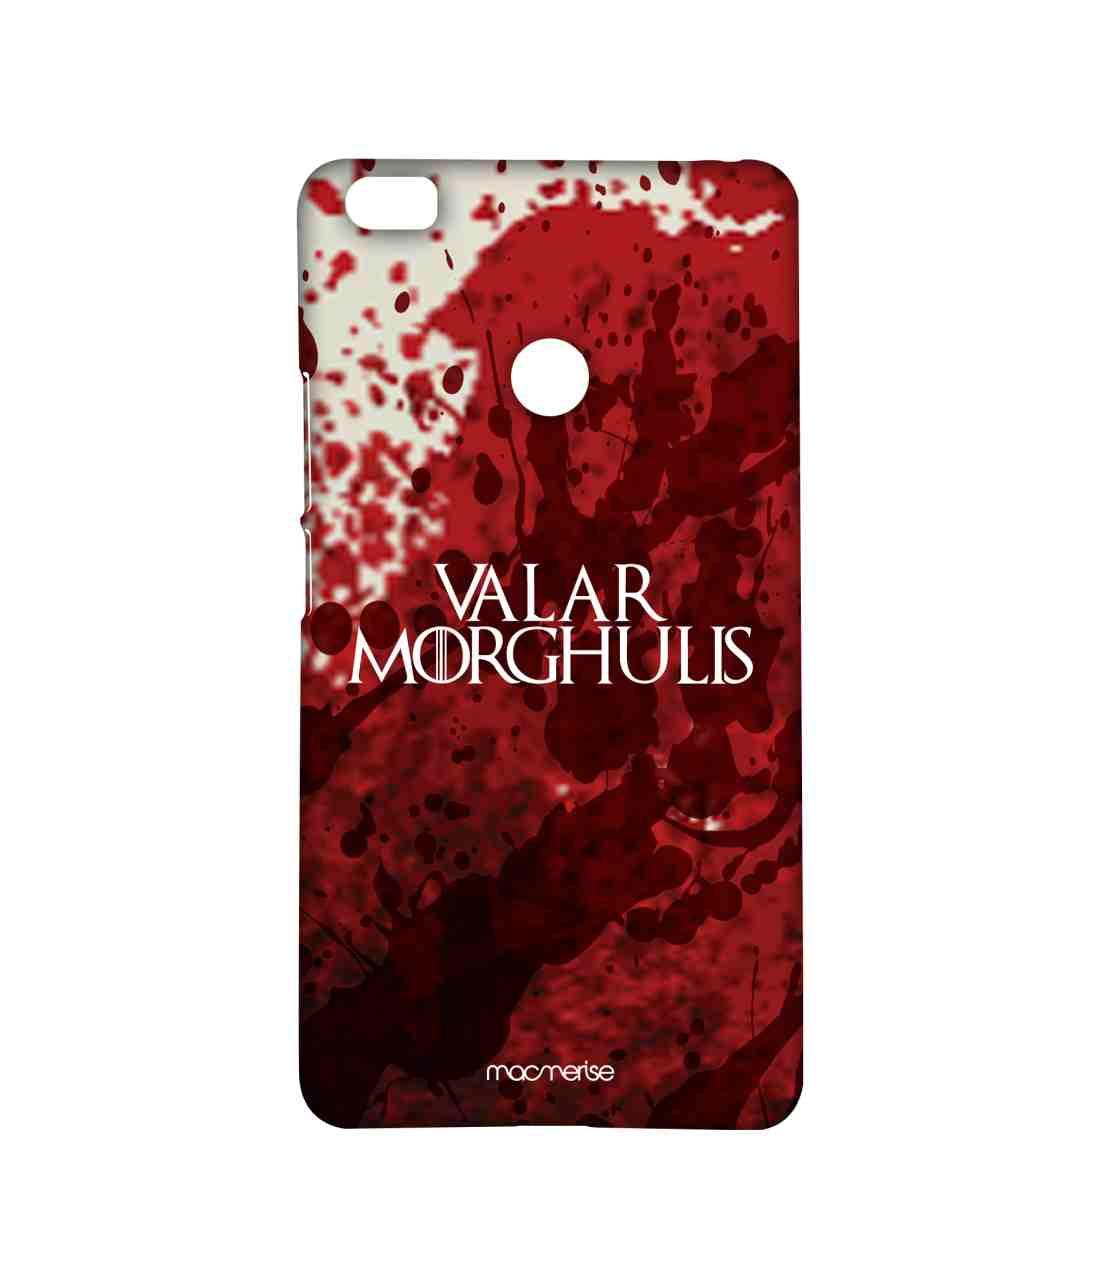 Valar Morghulis - Sublime Case for Xiaomi Mi Max